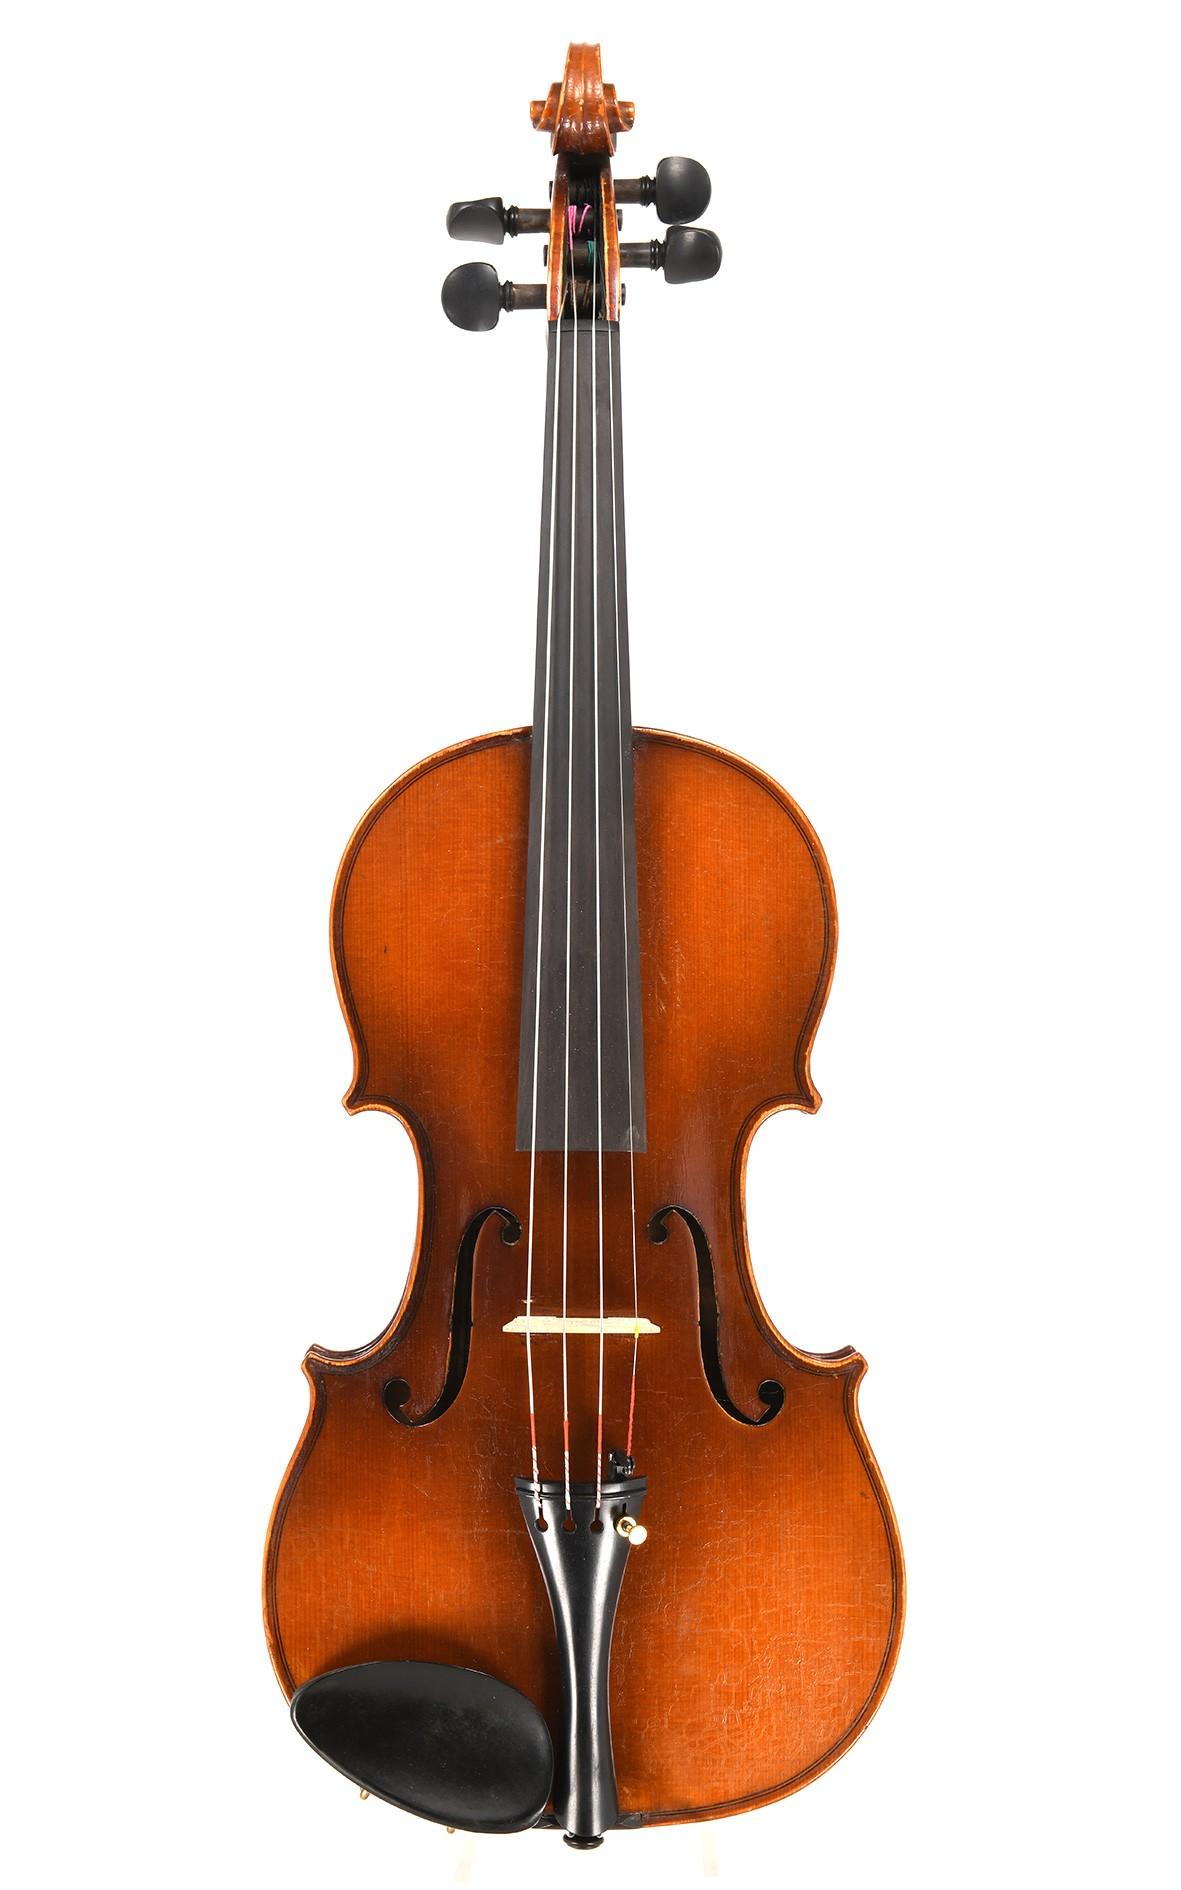 Violin by Frank Reiner